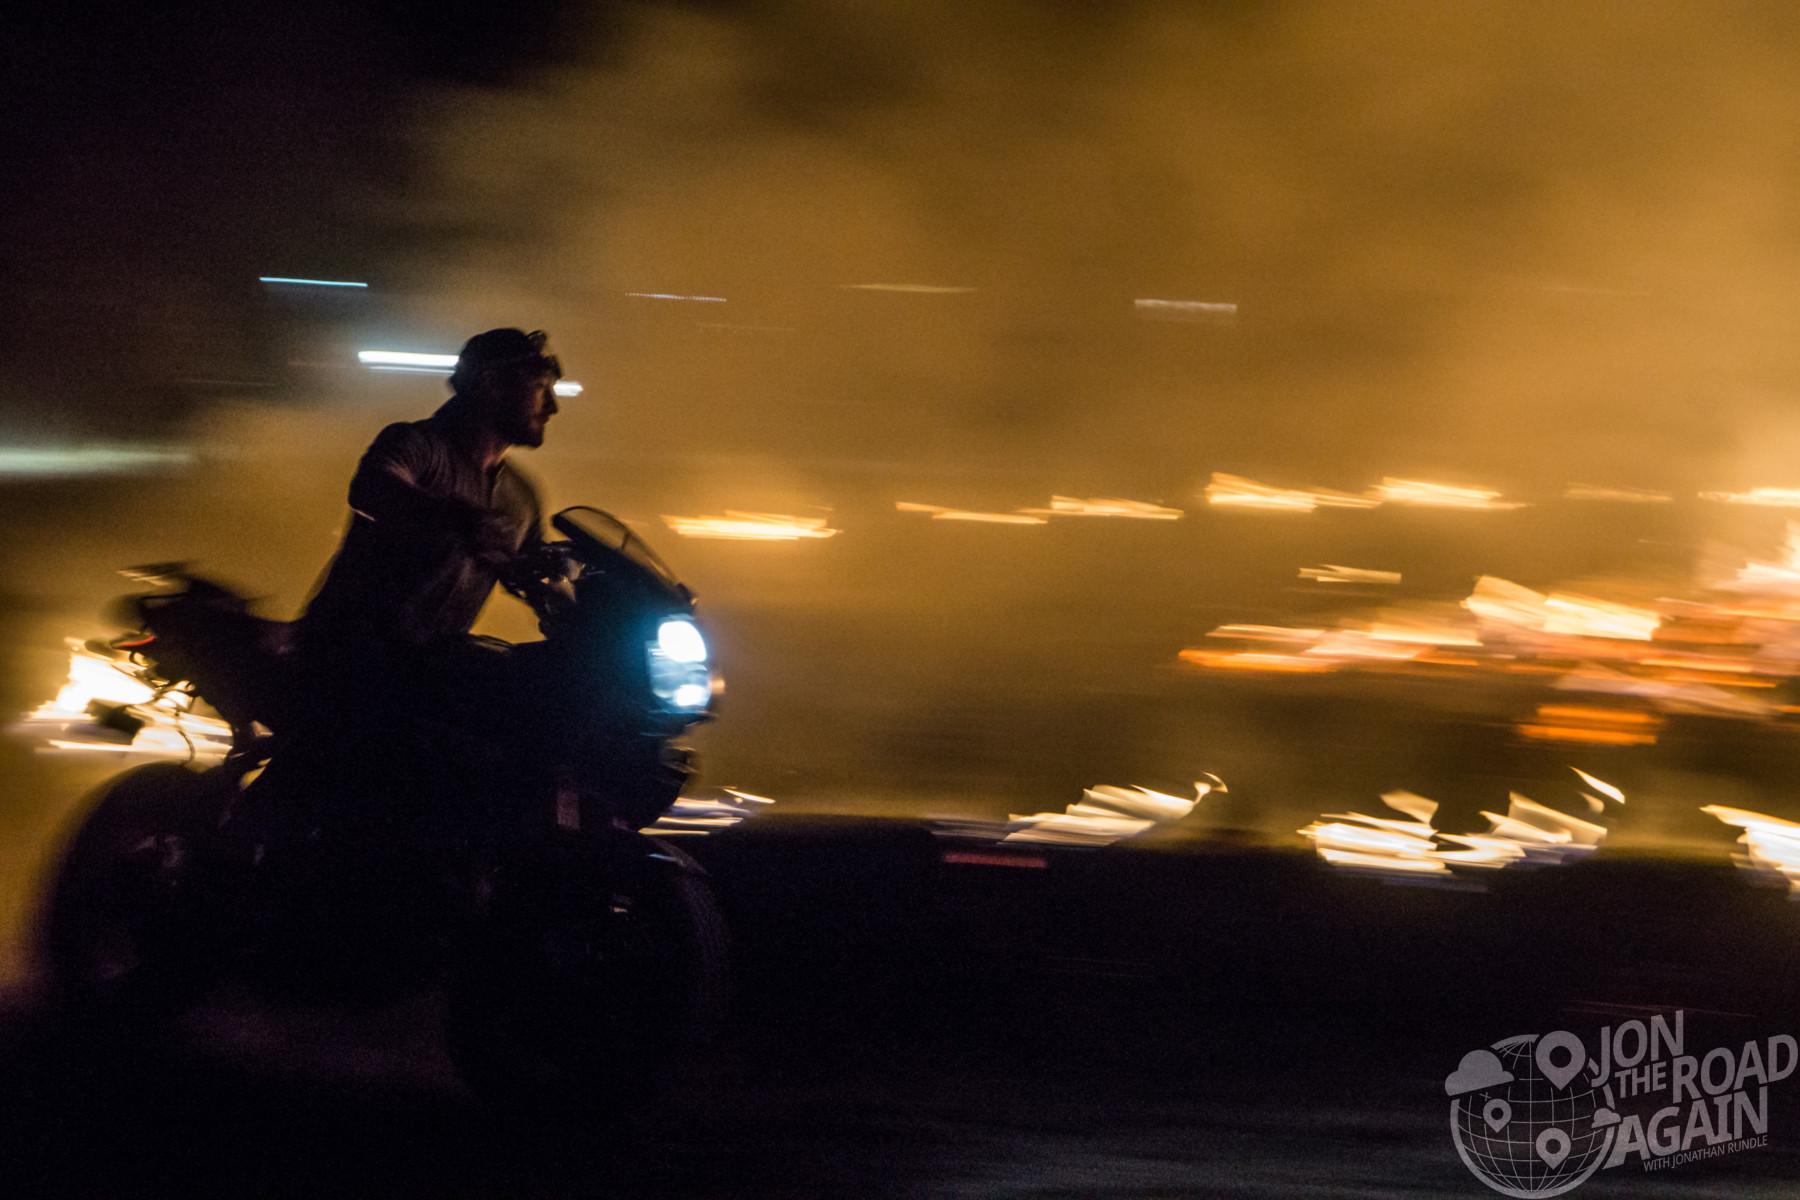 Motos in Moab motorcycle bonfire